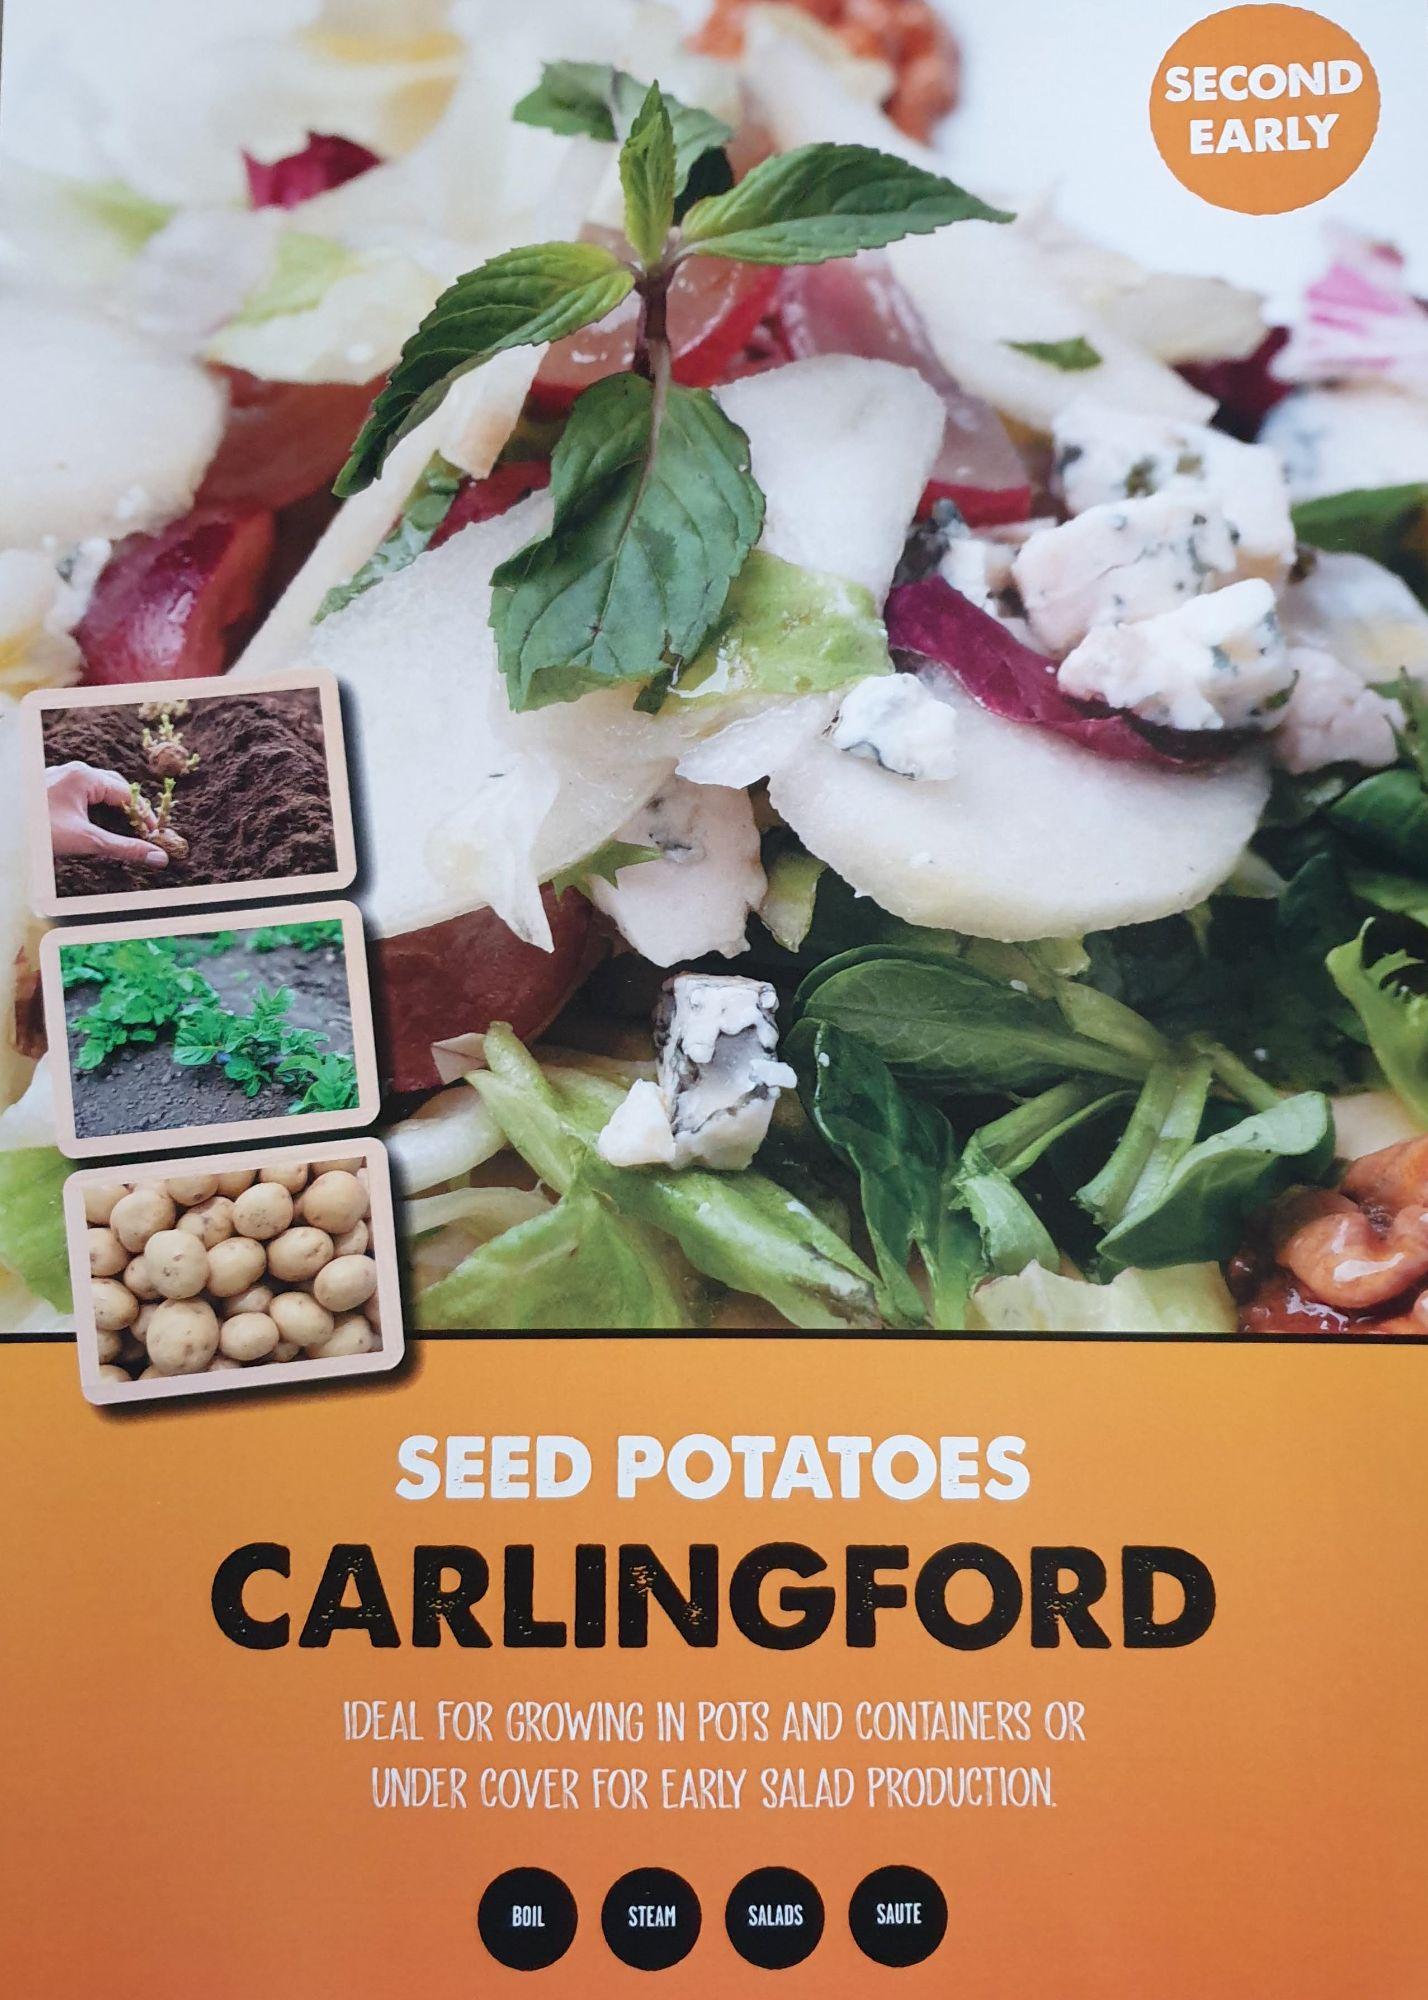 carlingford_seed_potato_info.jpg